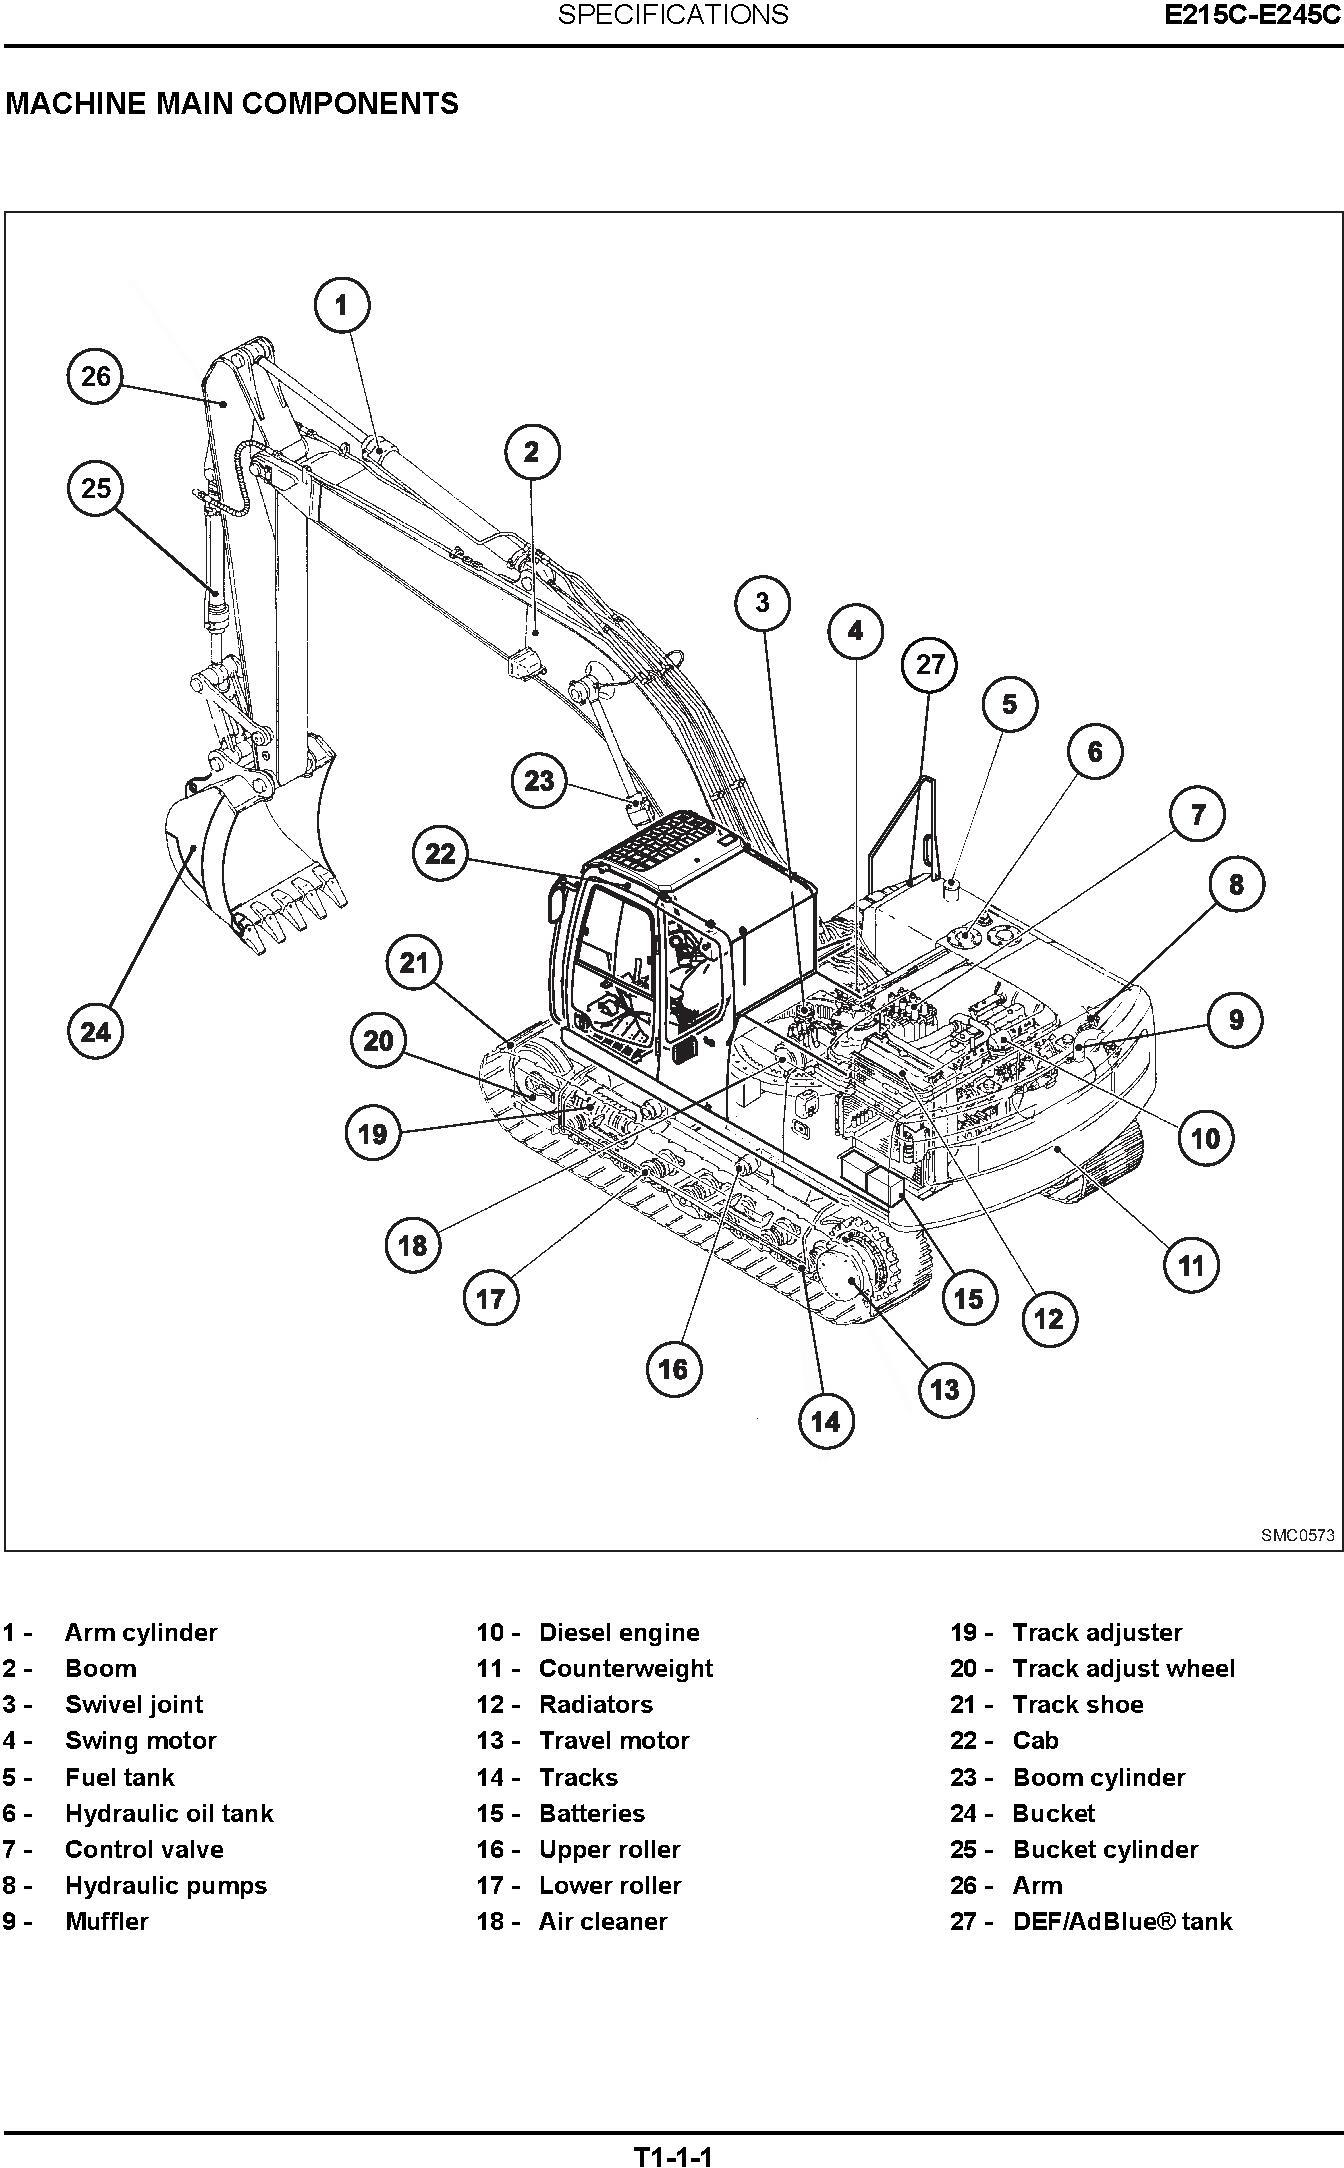 New Holland E215C, E245C Tier IV Crawler Excavators Service Manual (10-2011) - 1